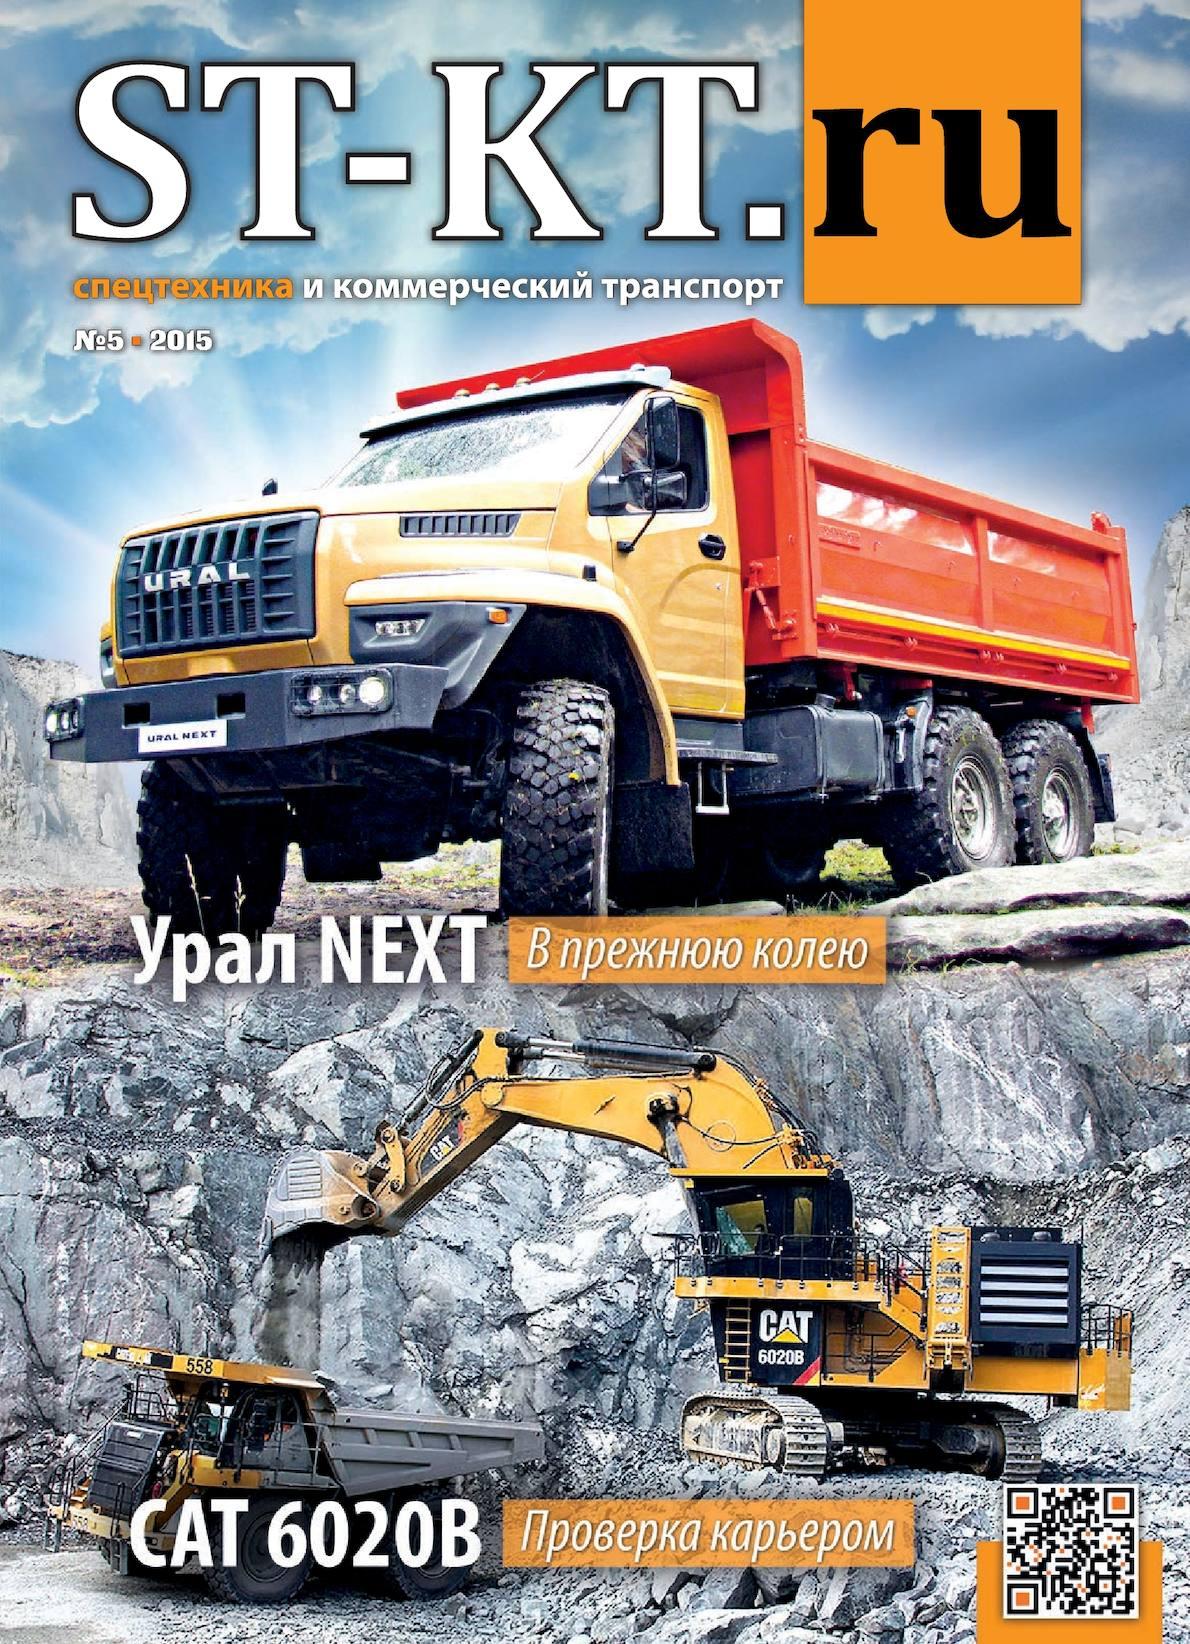 СпецТехника и Коммерческий Транспорт №5/2015